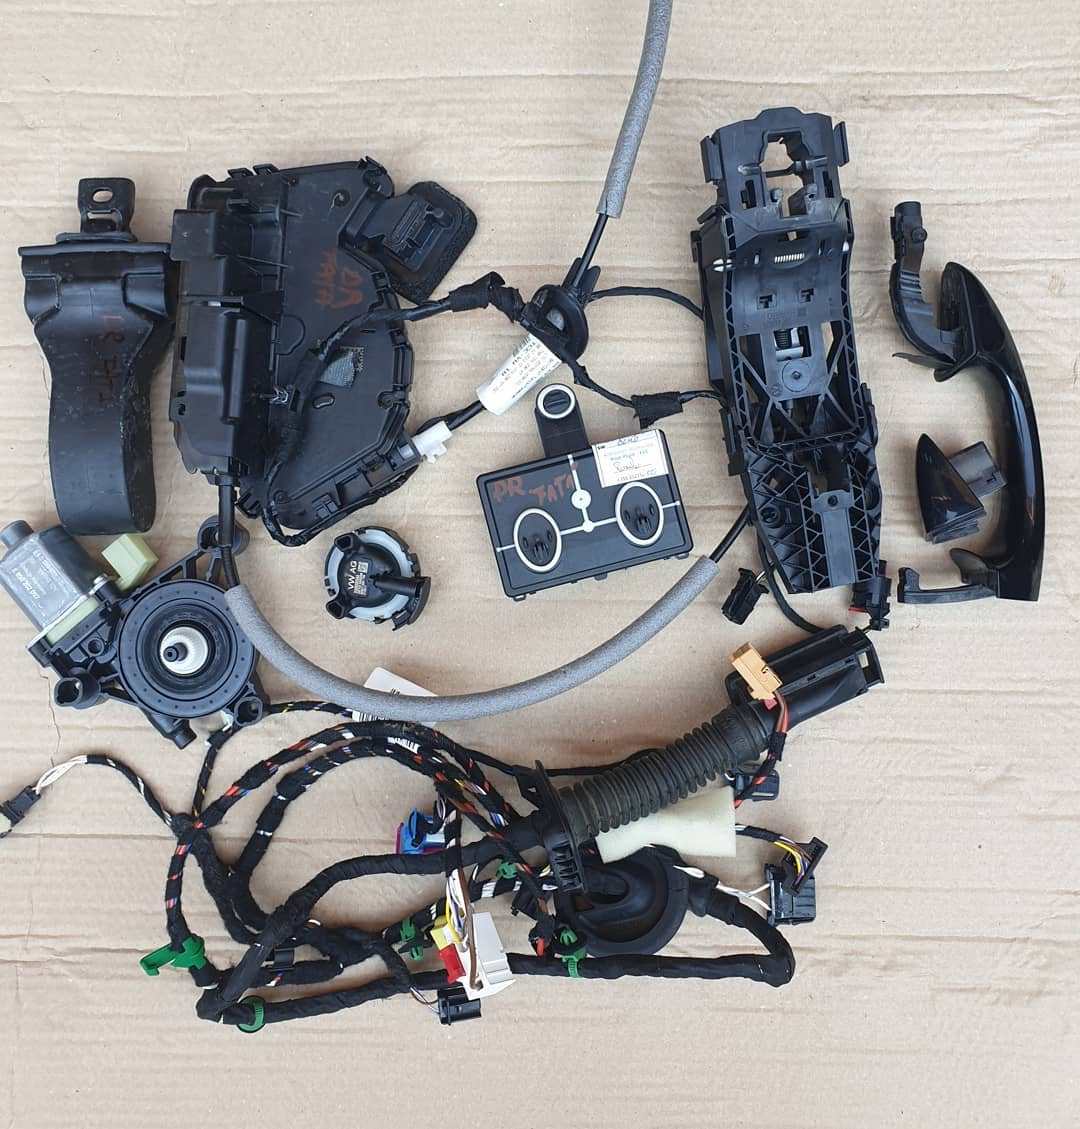 VW T-Roc Macara geam, motoras geam, plastic usa, senzor impact, broasca, incuietoare, maner, instalatie usa dreapta fata.